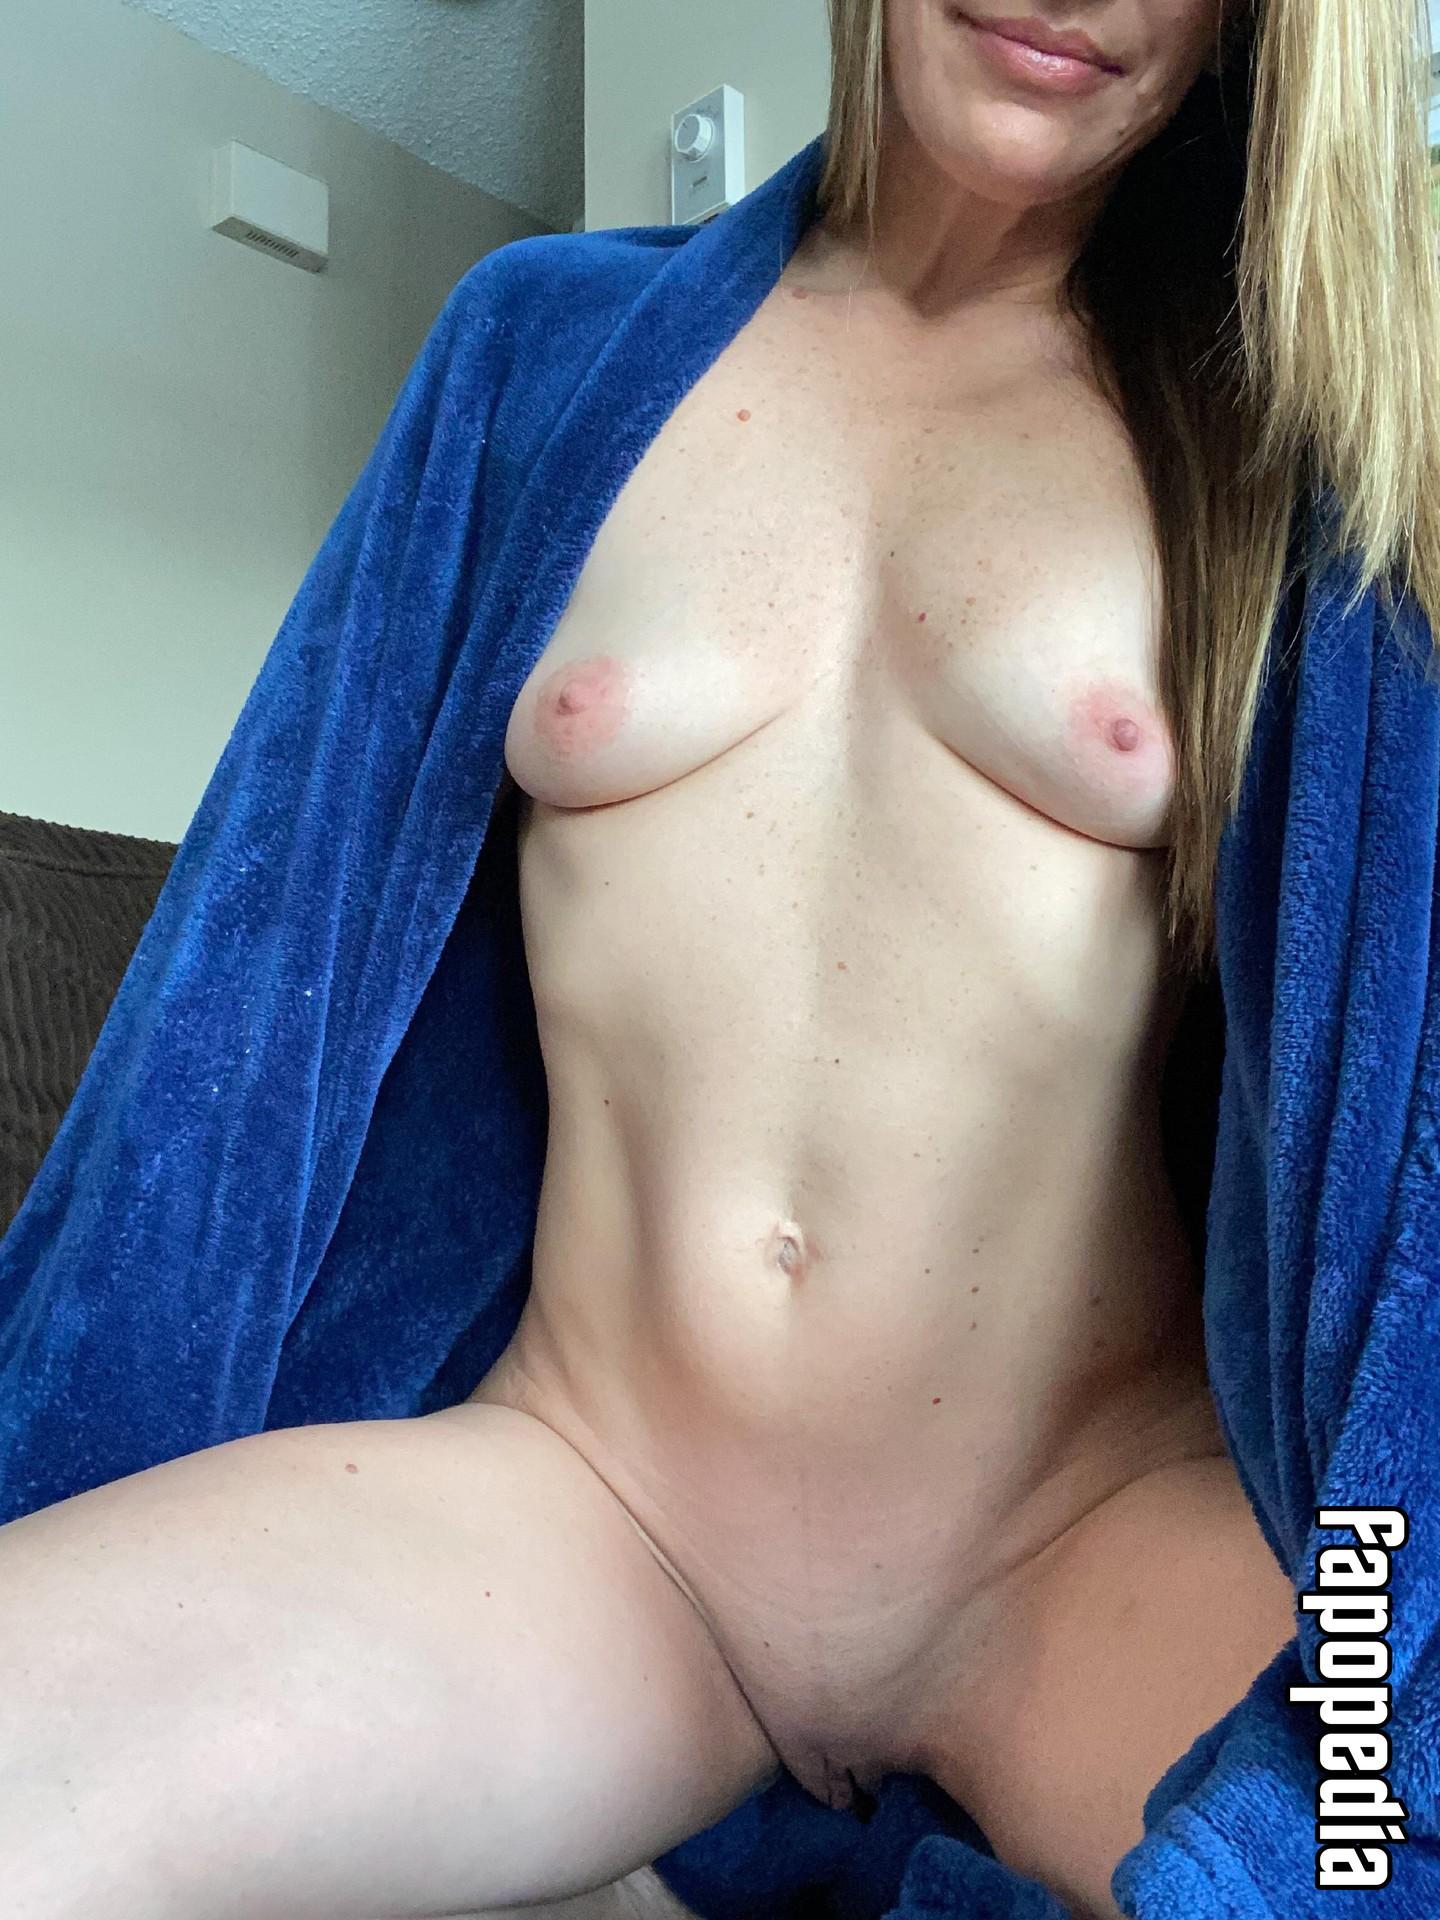 SexyWife59 Nude Leaks